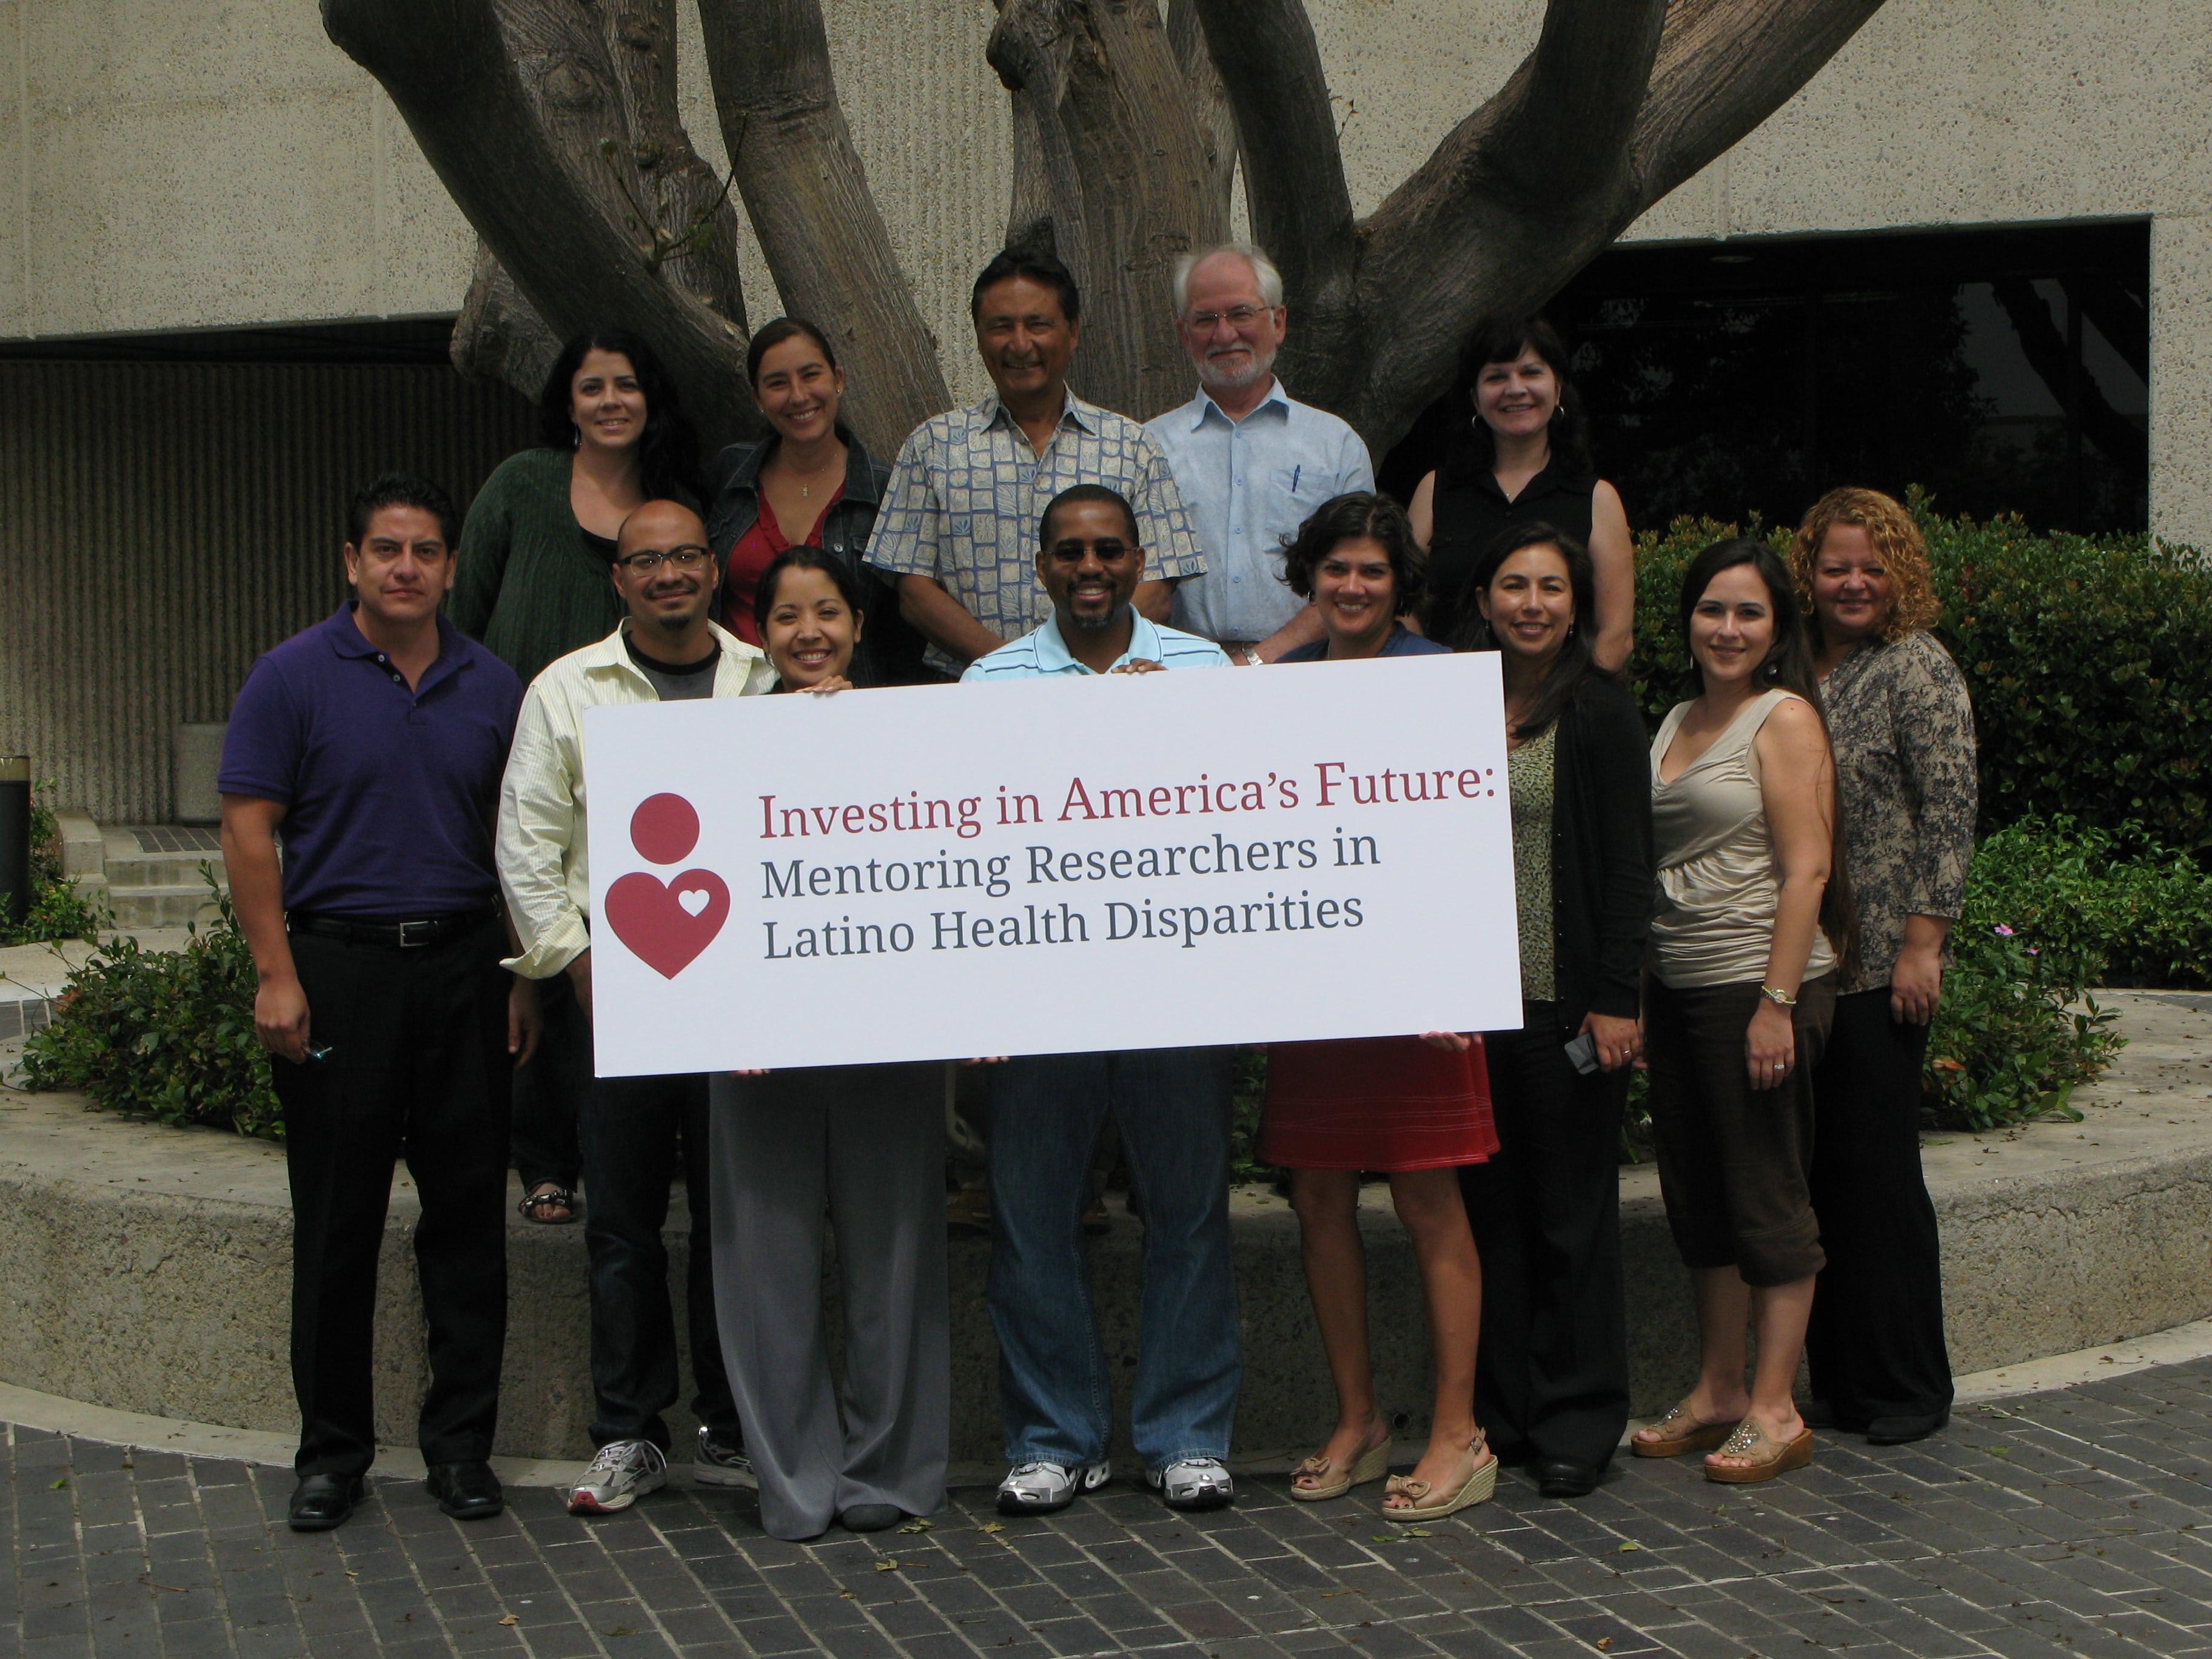 Investing In America's Future: Mentoring Researchers in Latino Health Disparities